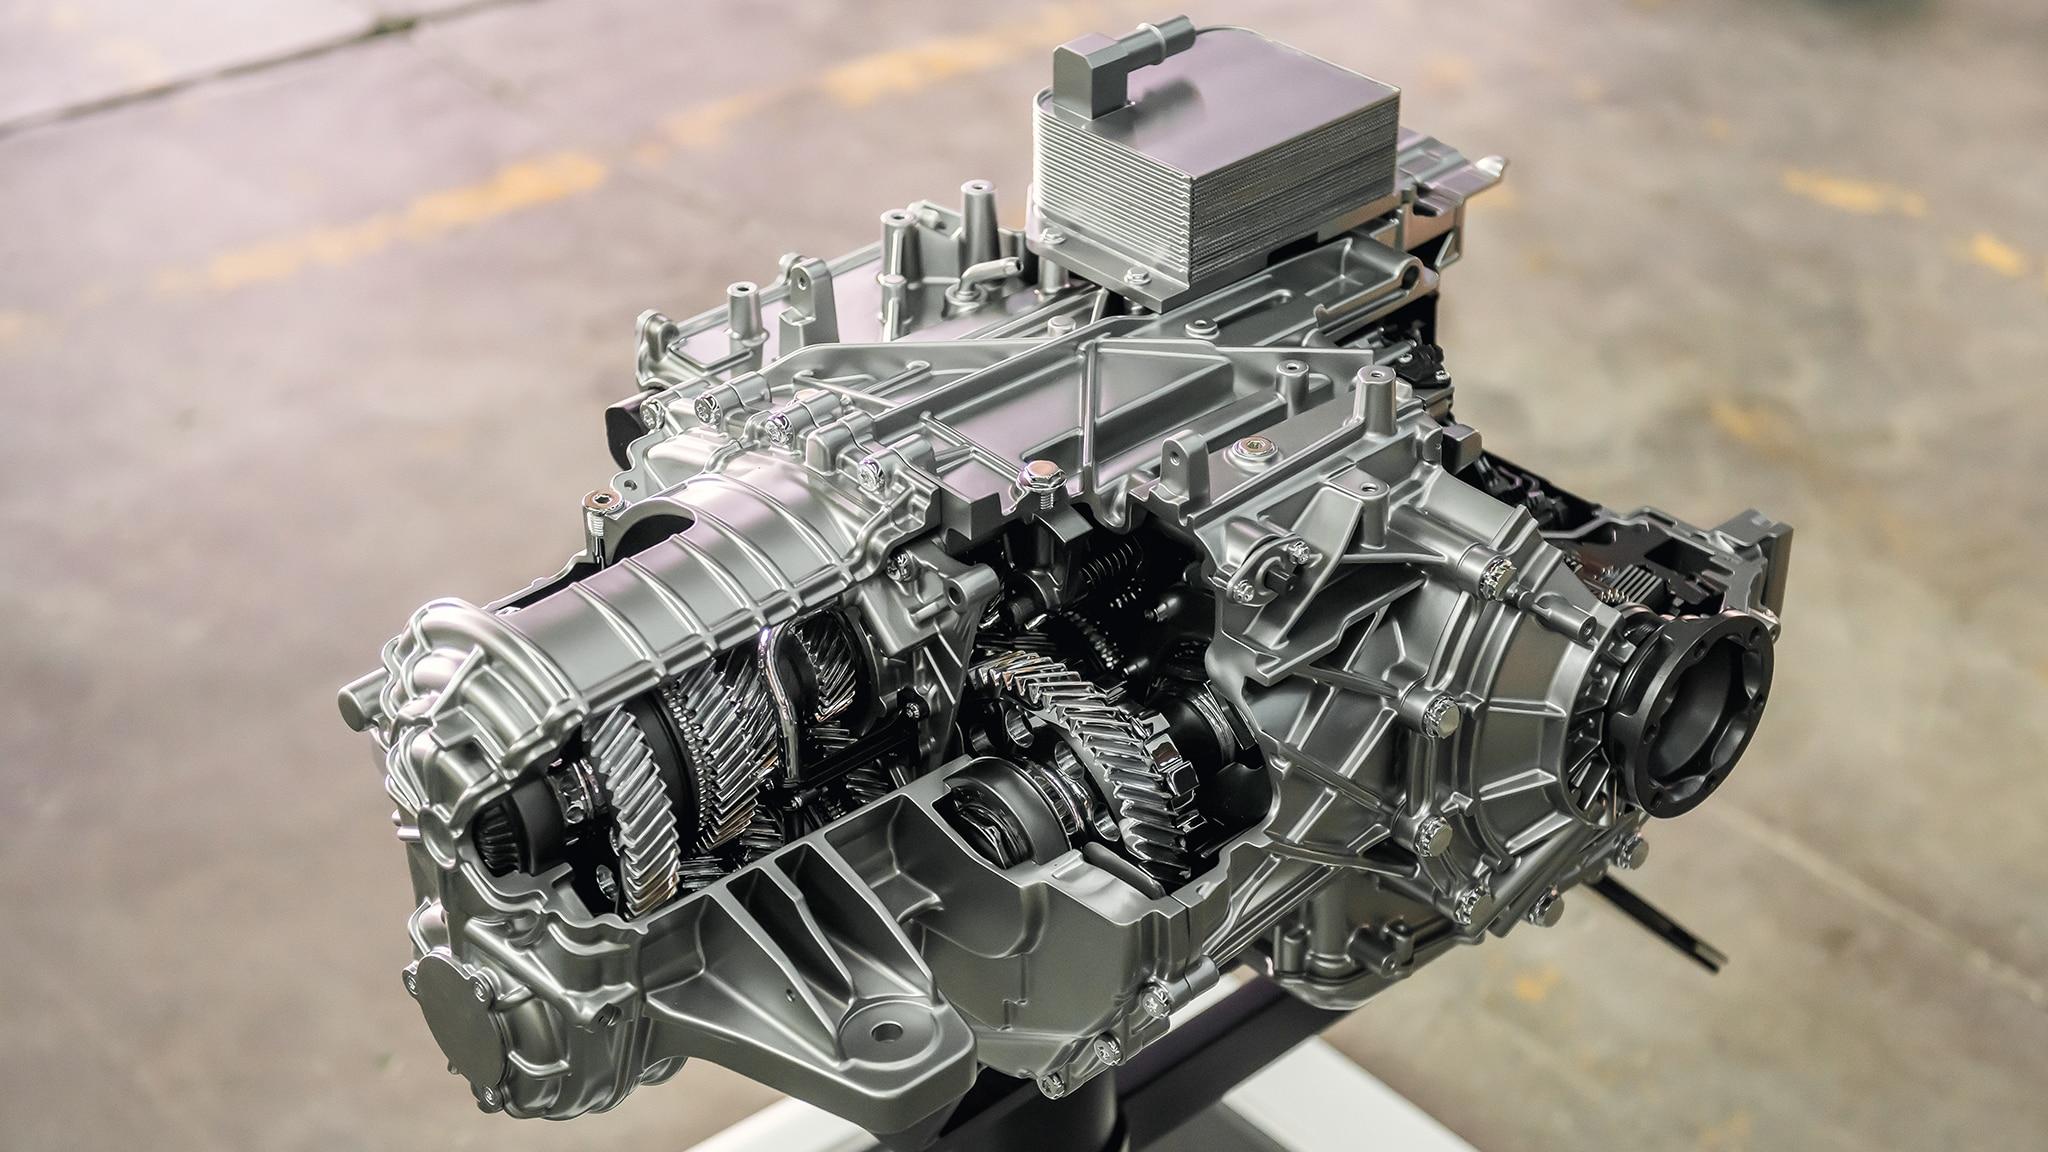 c5 corvette drivetrain diagram wiring library C5 C6 Corvette Automatic Drivetrain